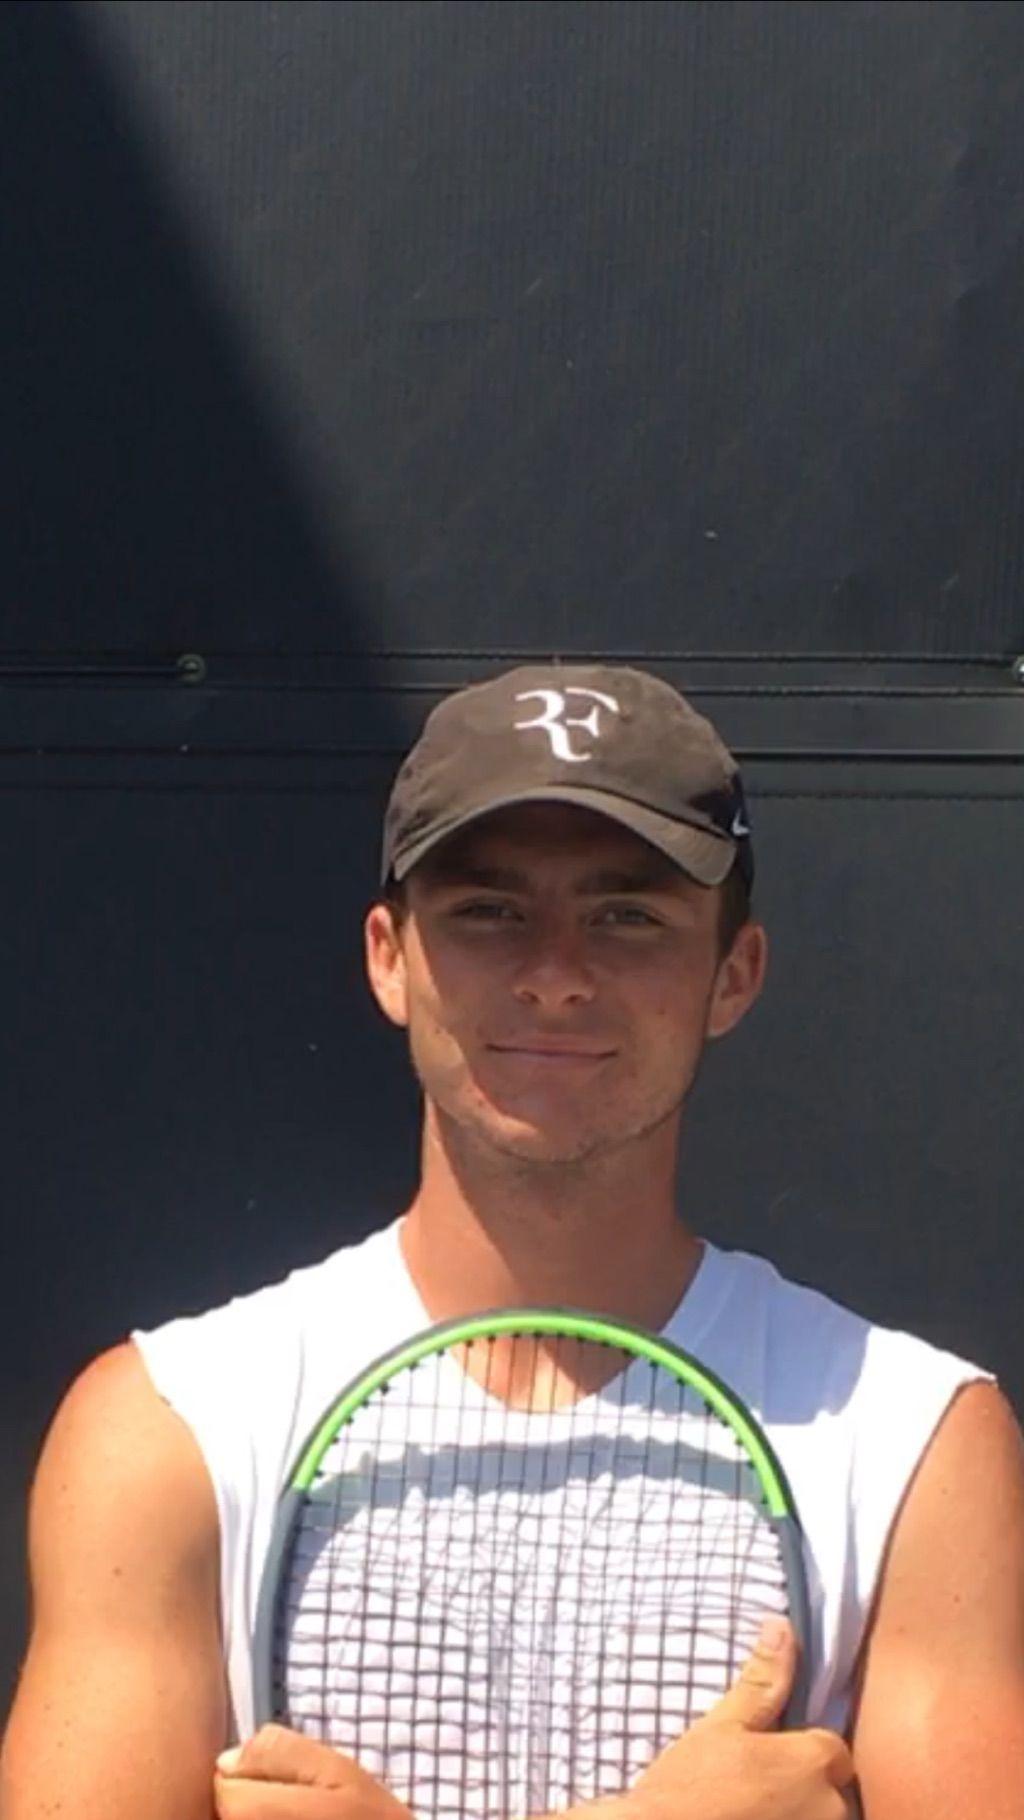 Ambrose Trear Tennis Instruction